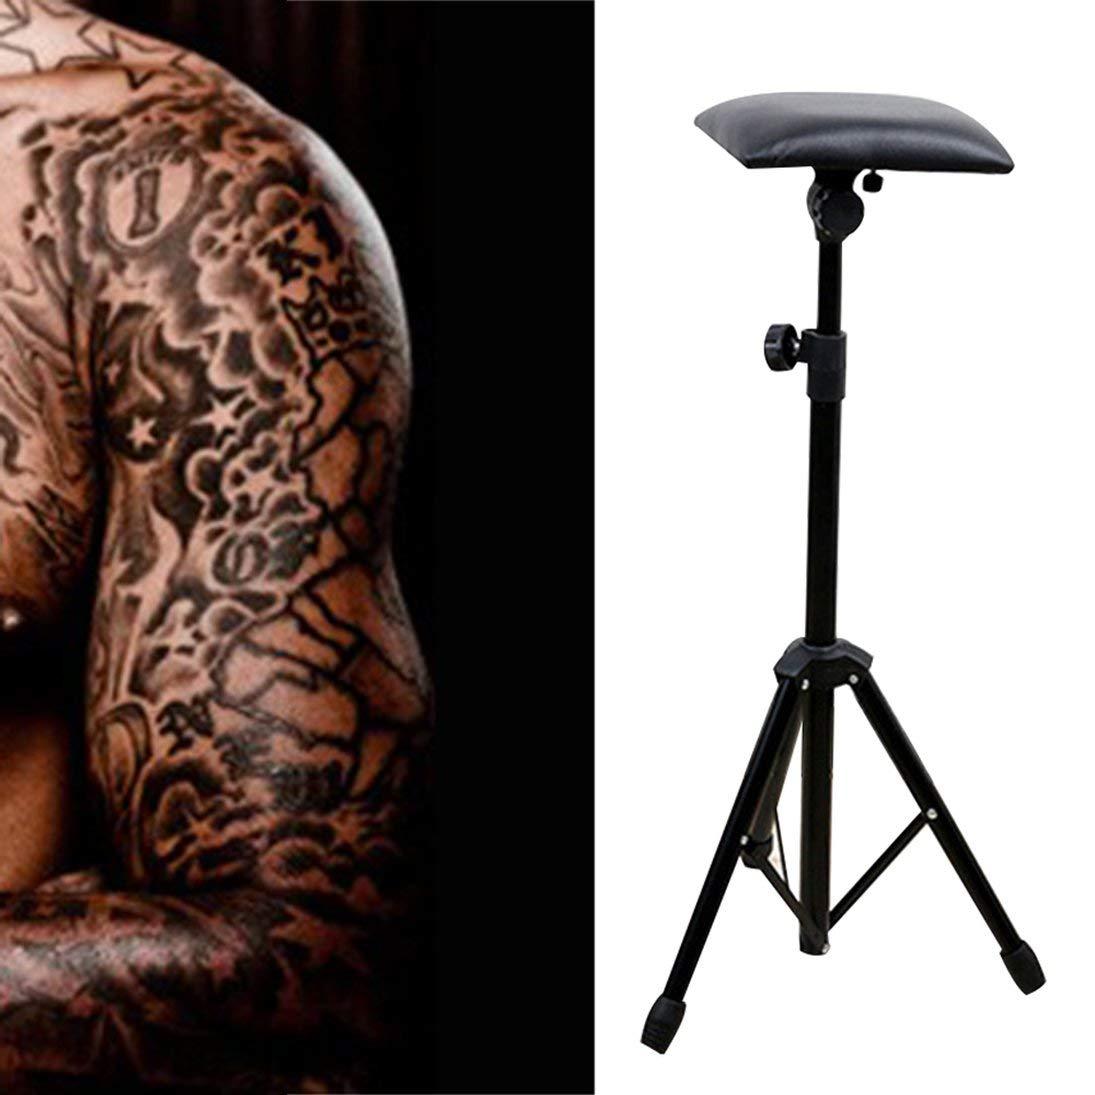 ToGames Herramienta de Equipo de Tatuaje Soporte de Mano de Tatuaje de Acero al manganeso Soporte de Brazo port/átil Marco de Soporte Plegable